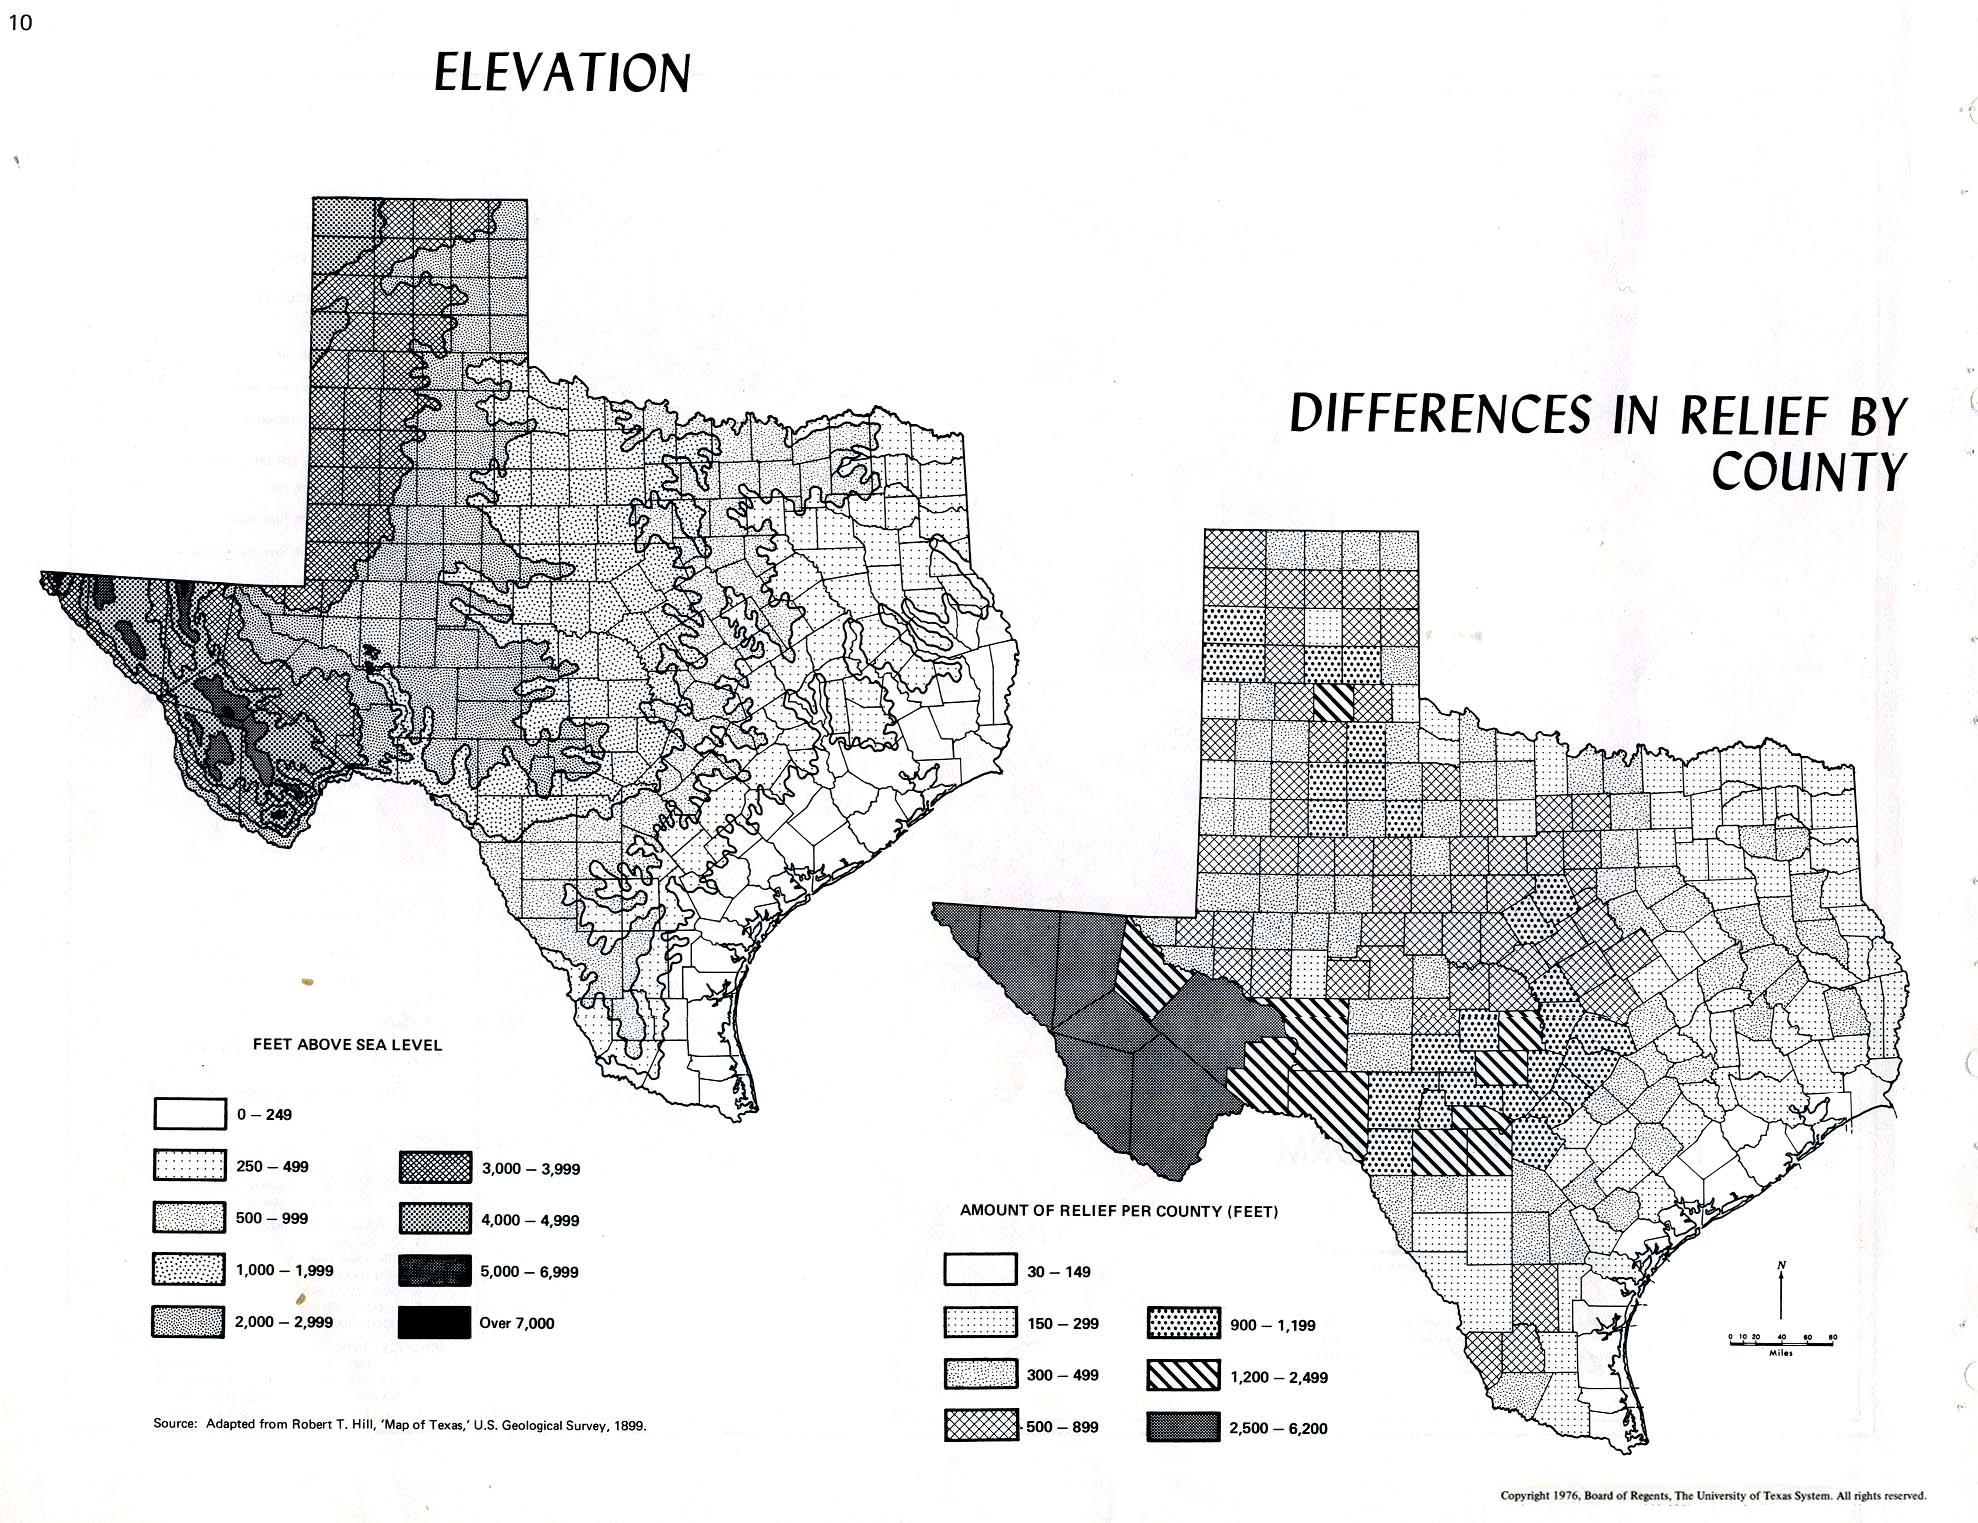 atlas of texas perry castaneda map collection ut library online atlas of texas perry castaneda map